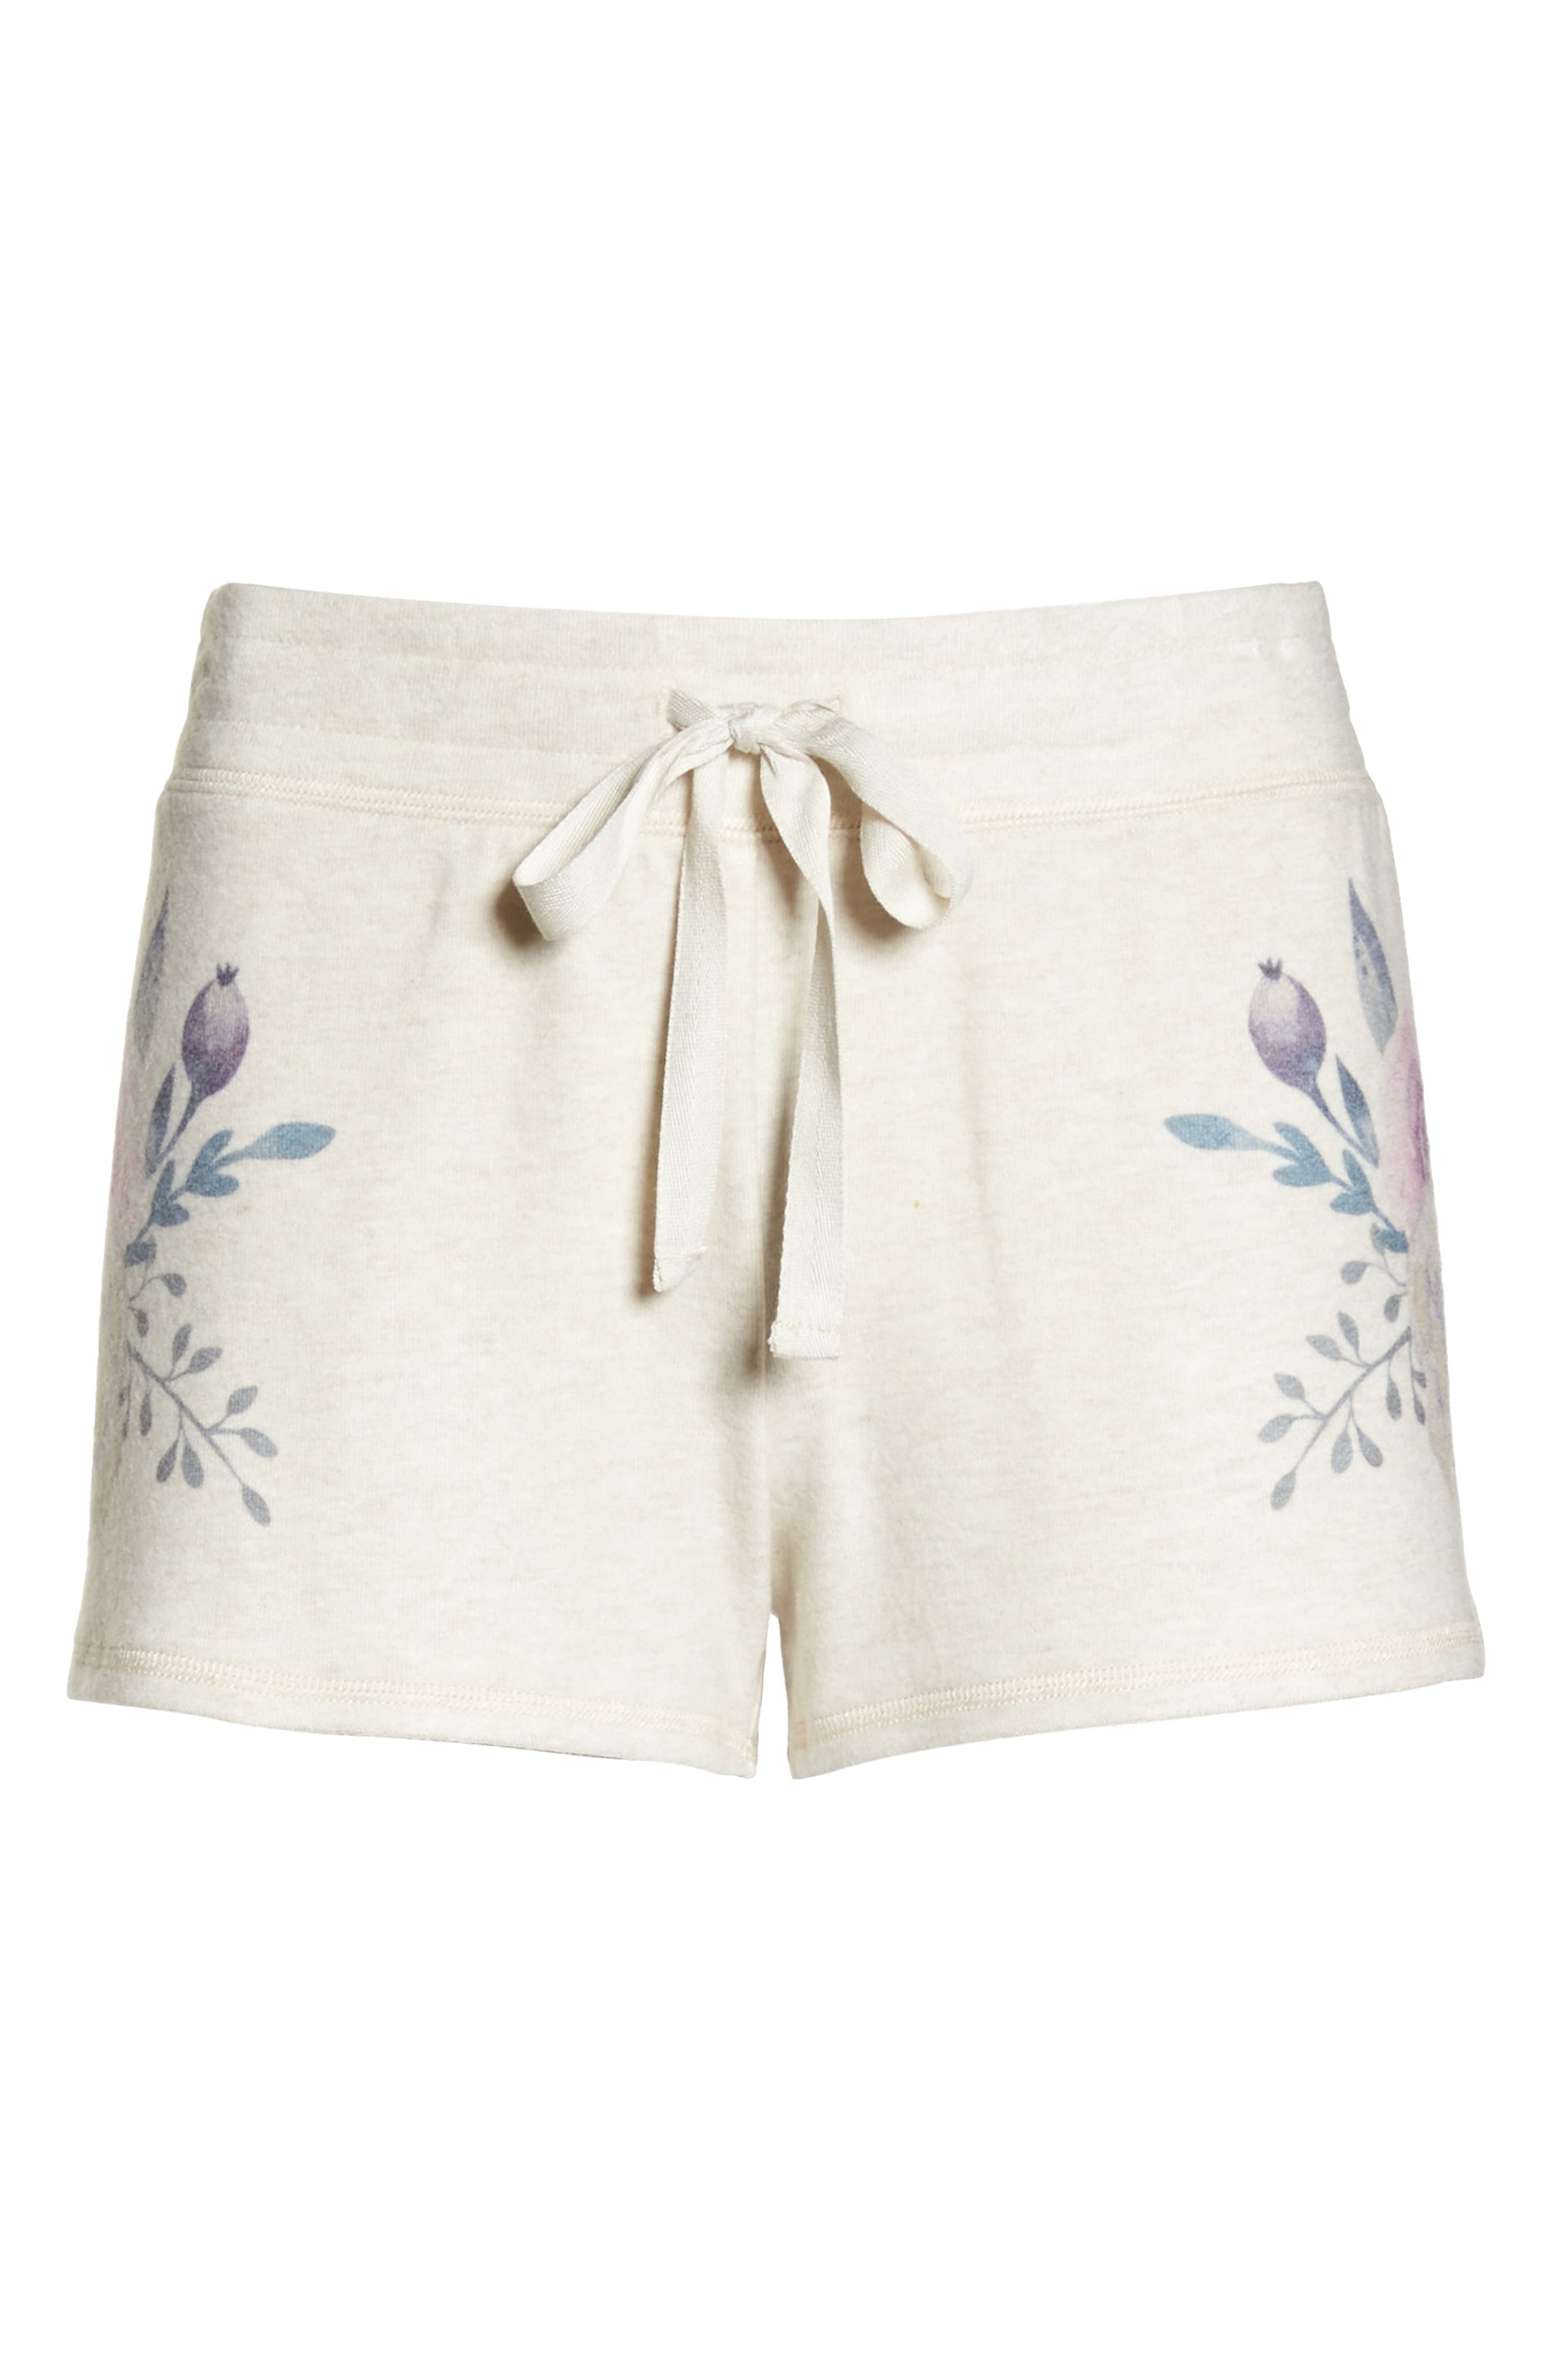 Peachy Floral Pajama Shorts,                             Alternate thumbnail 6, color,                             900